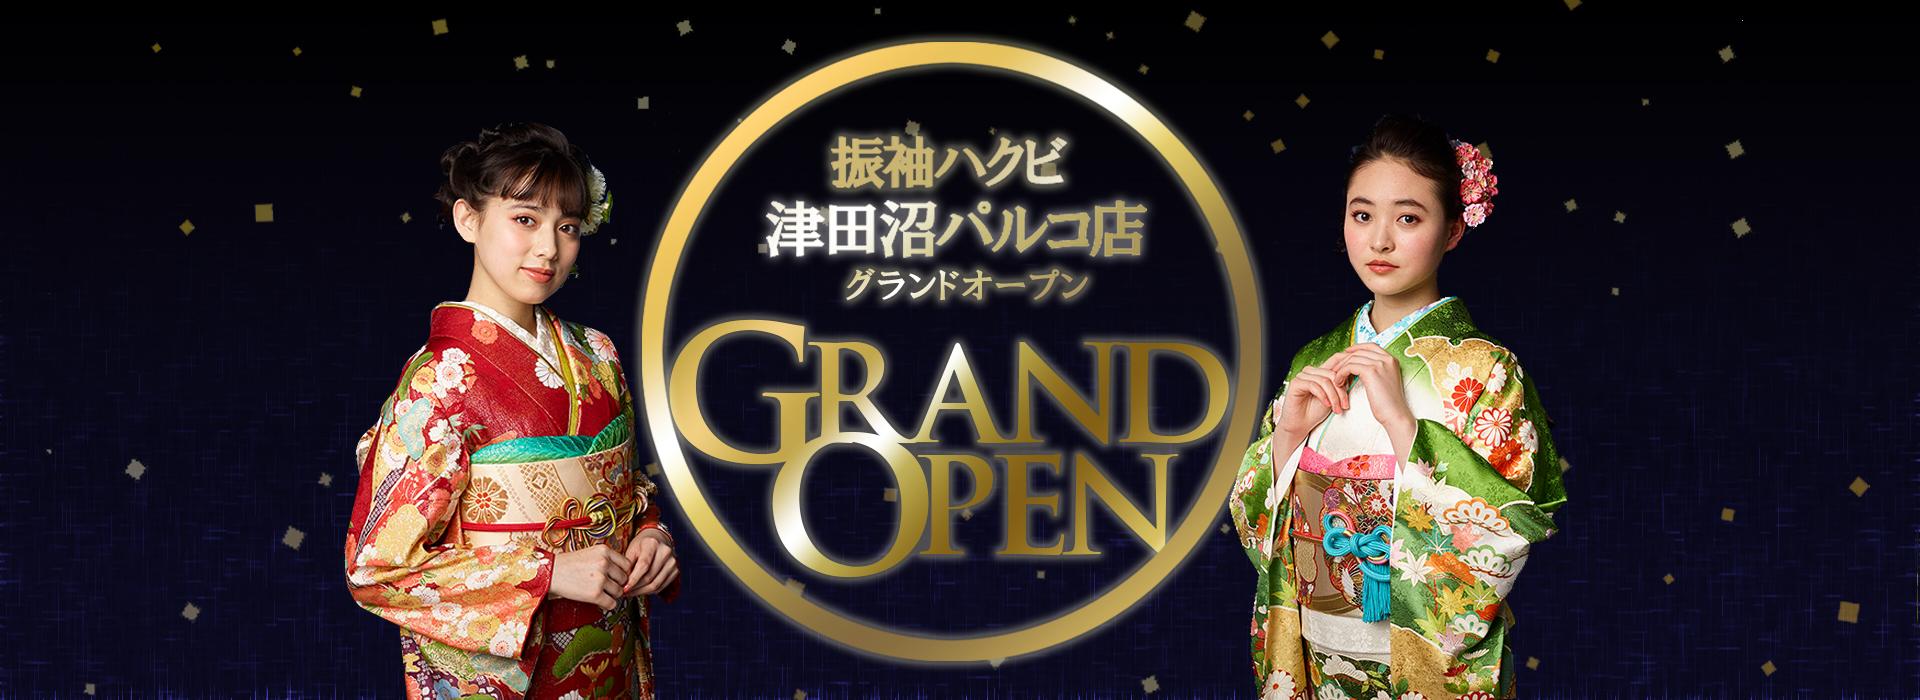 津田沼店 NEW OPEN